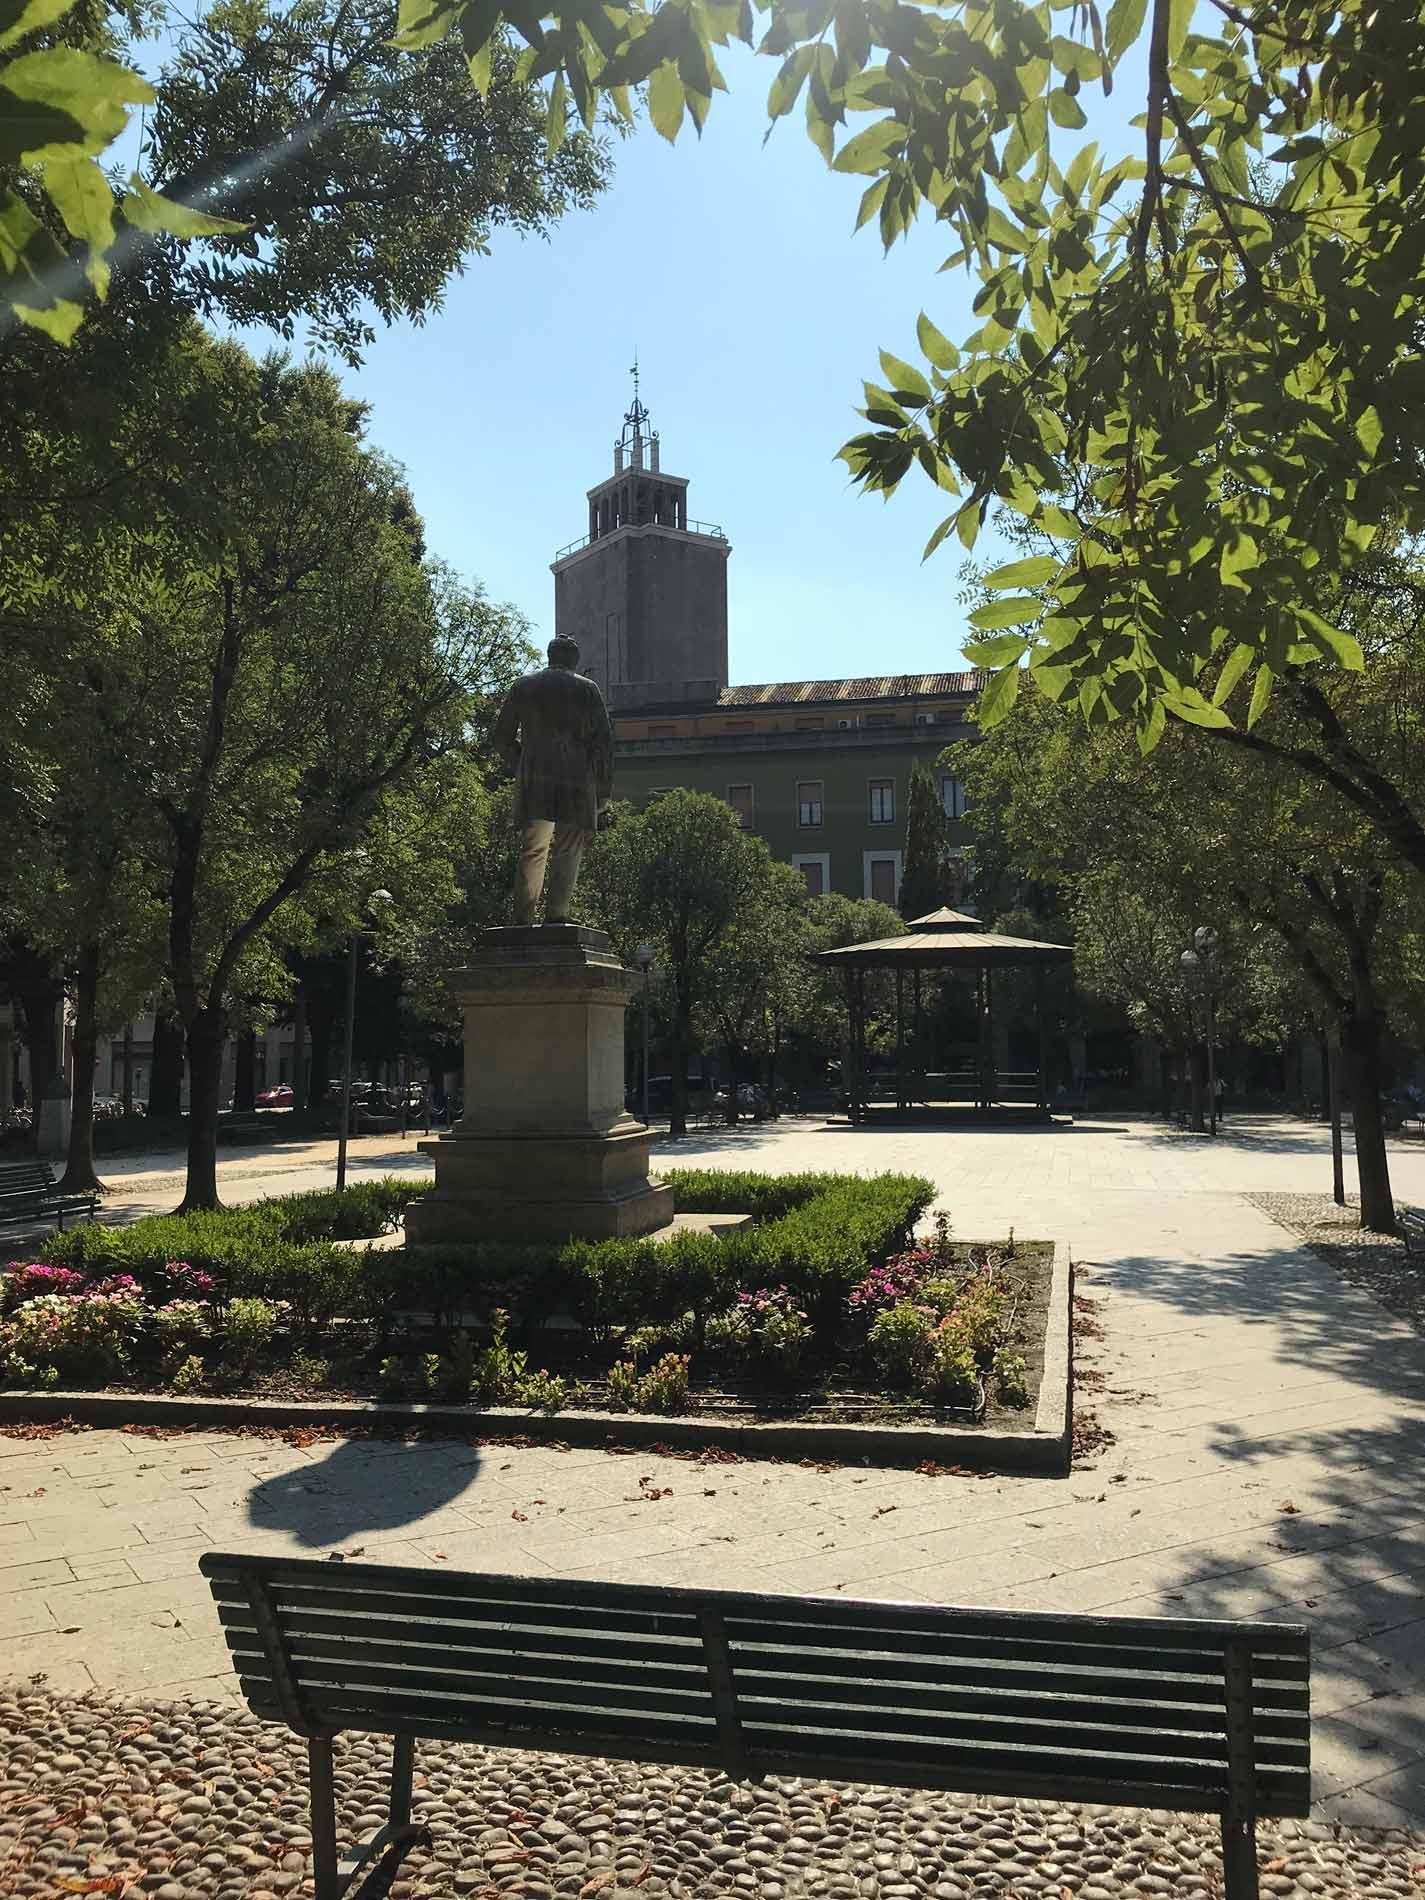 Piazza-Roma-cremona-statua-giardini-verde-alberi